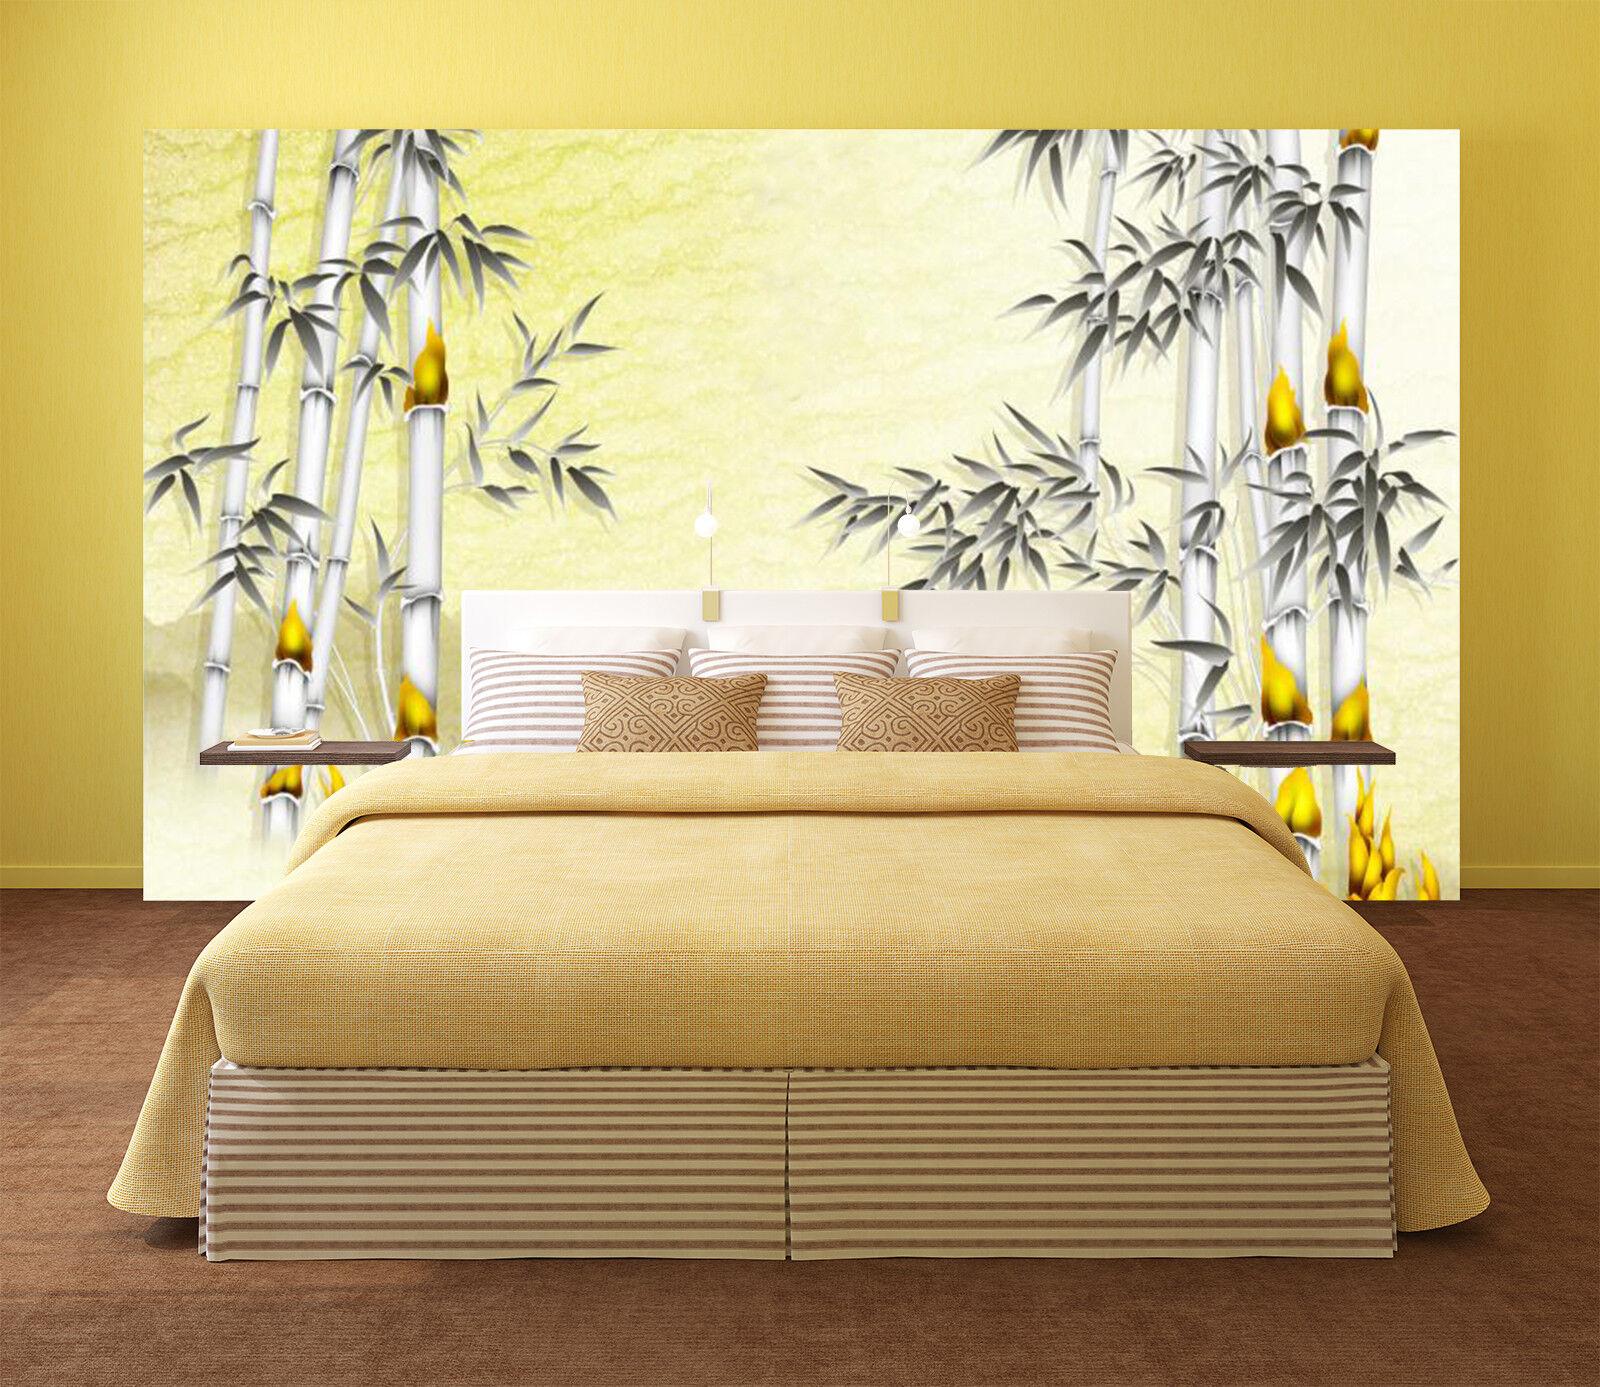 3D Bamboo Painting 8 Wall Paper Murals Wall Print Wall Wallpaper Mural AU Summer